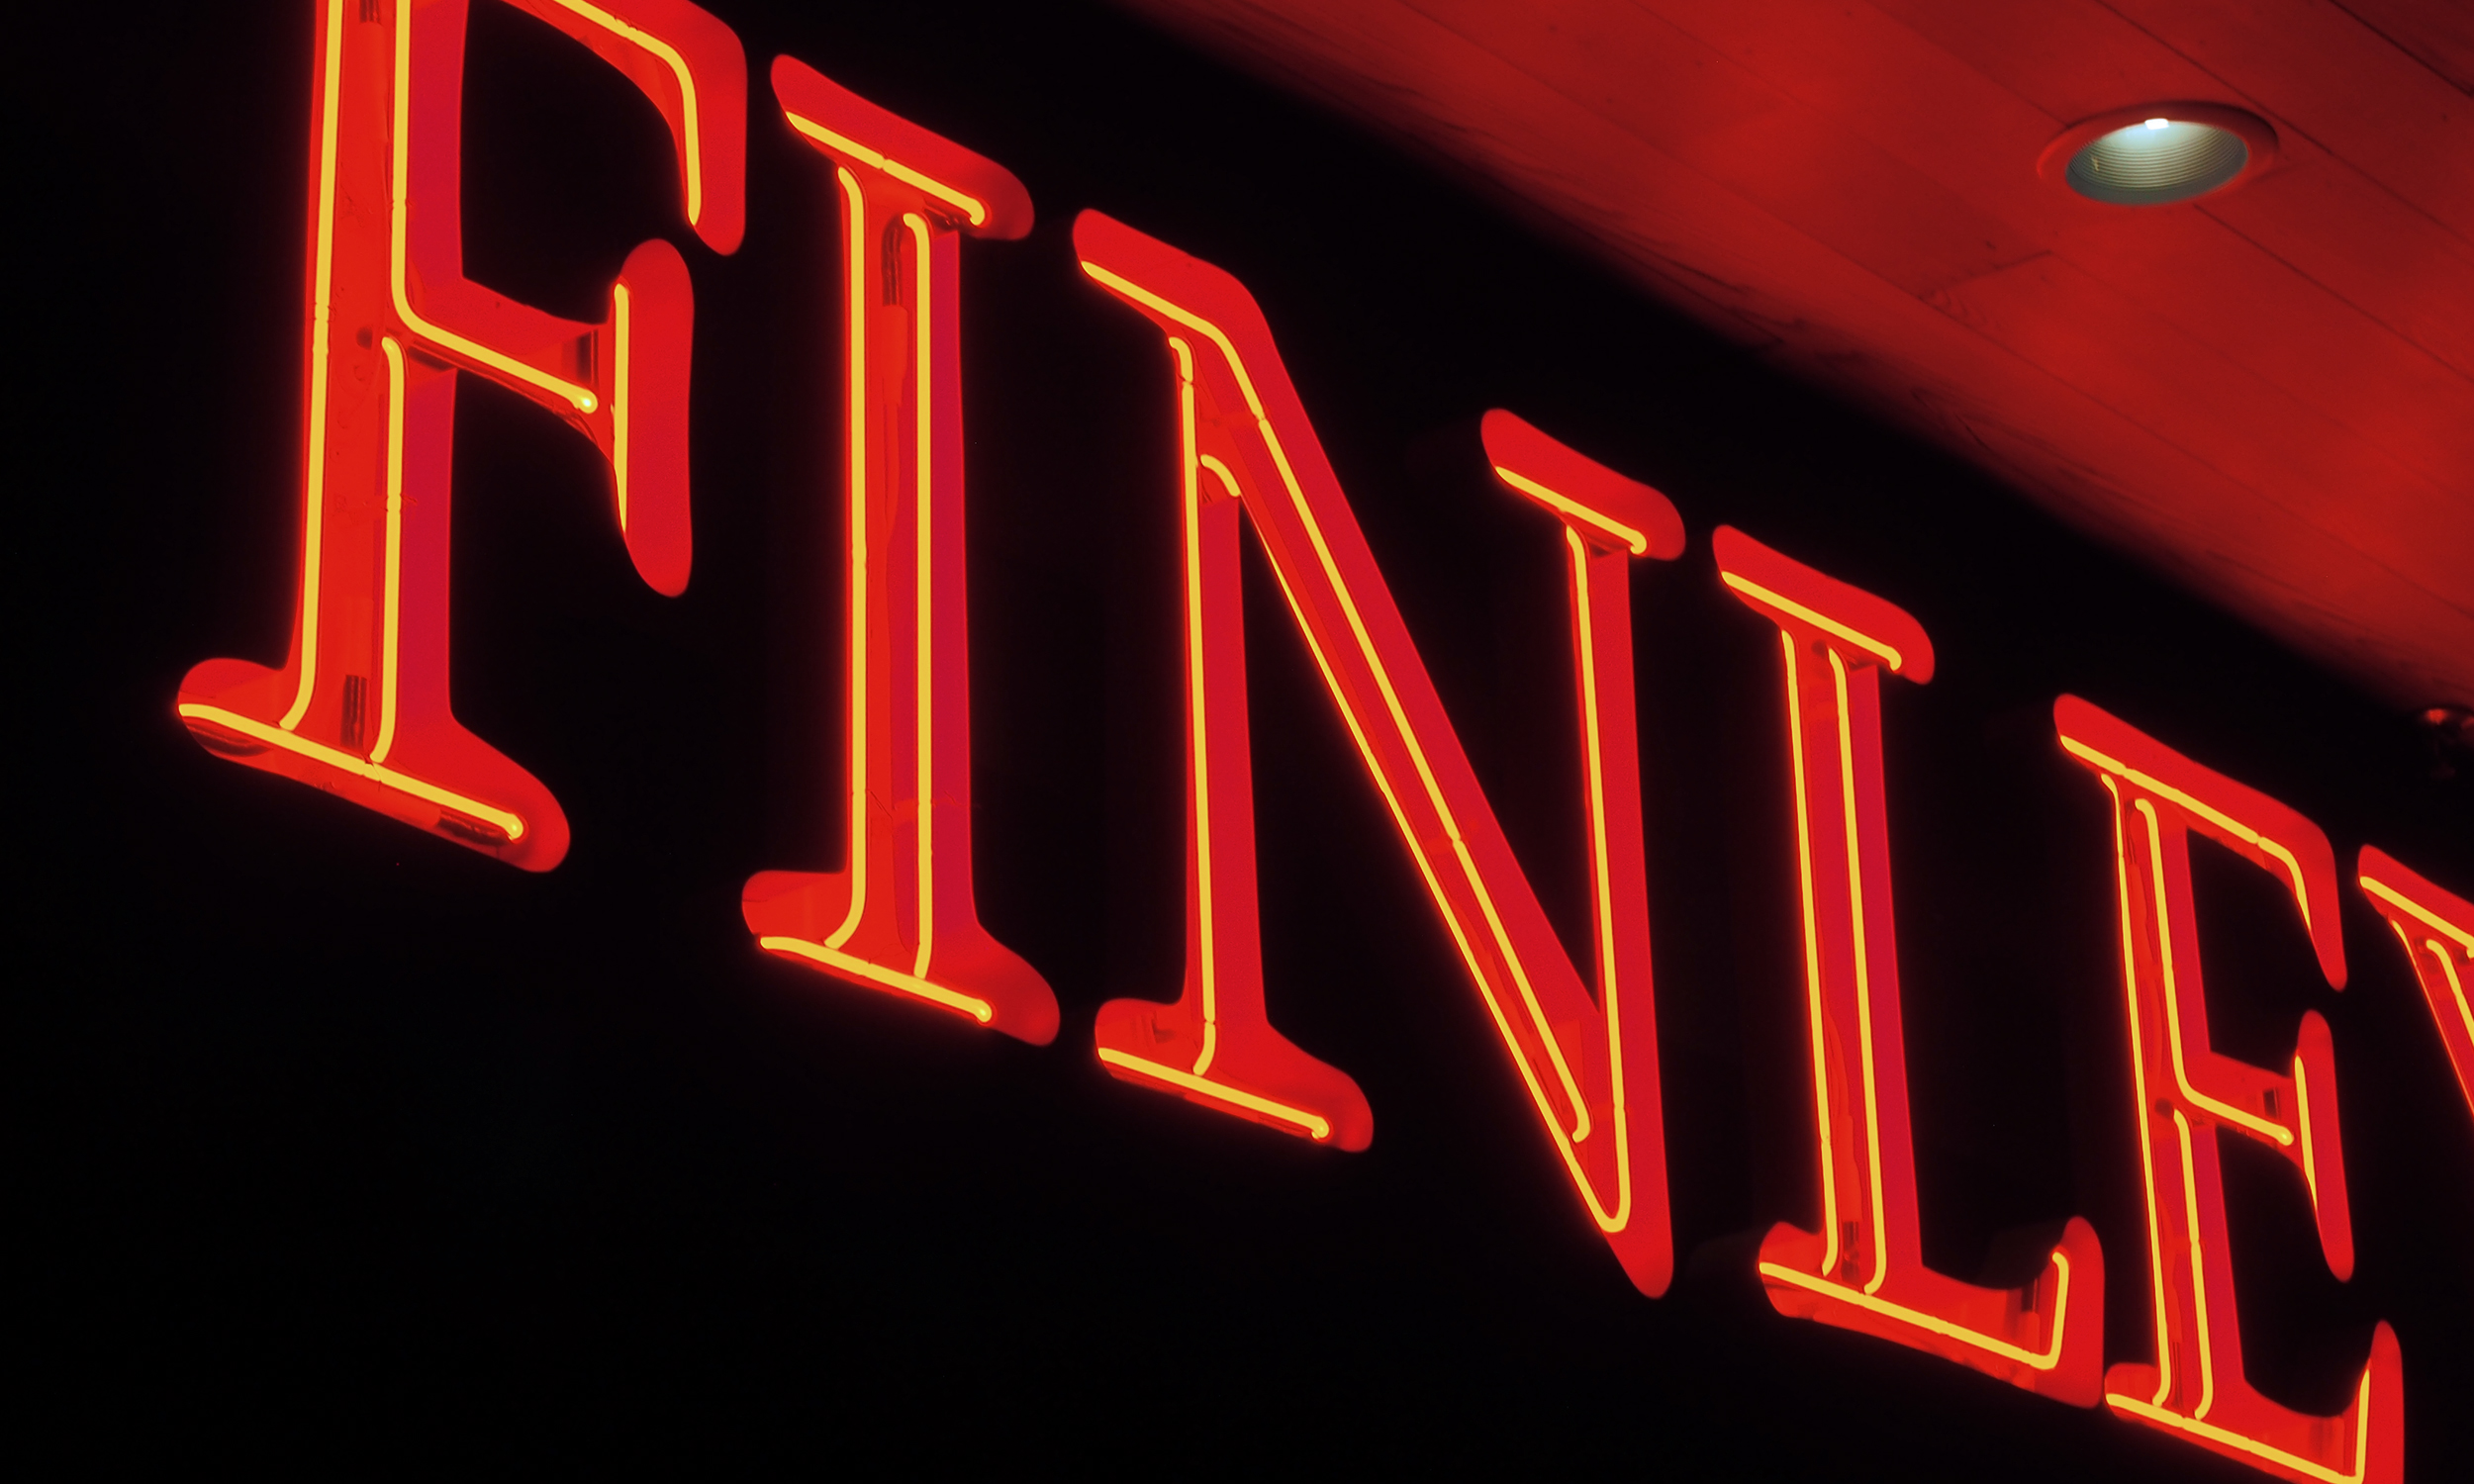 Finleys_Channel_Night_Close.jpg